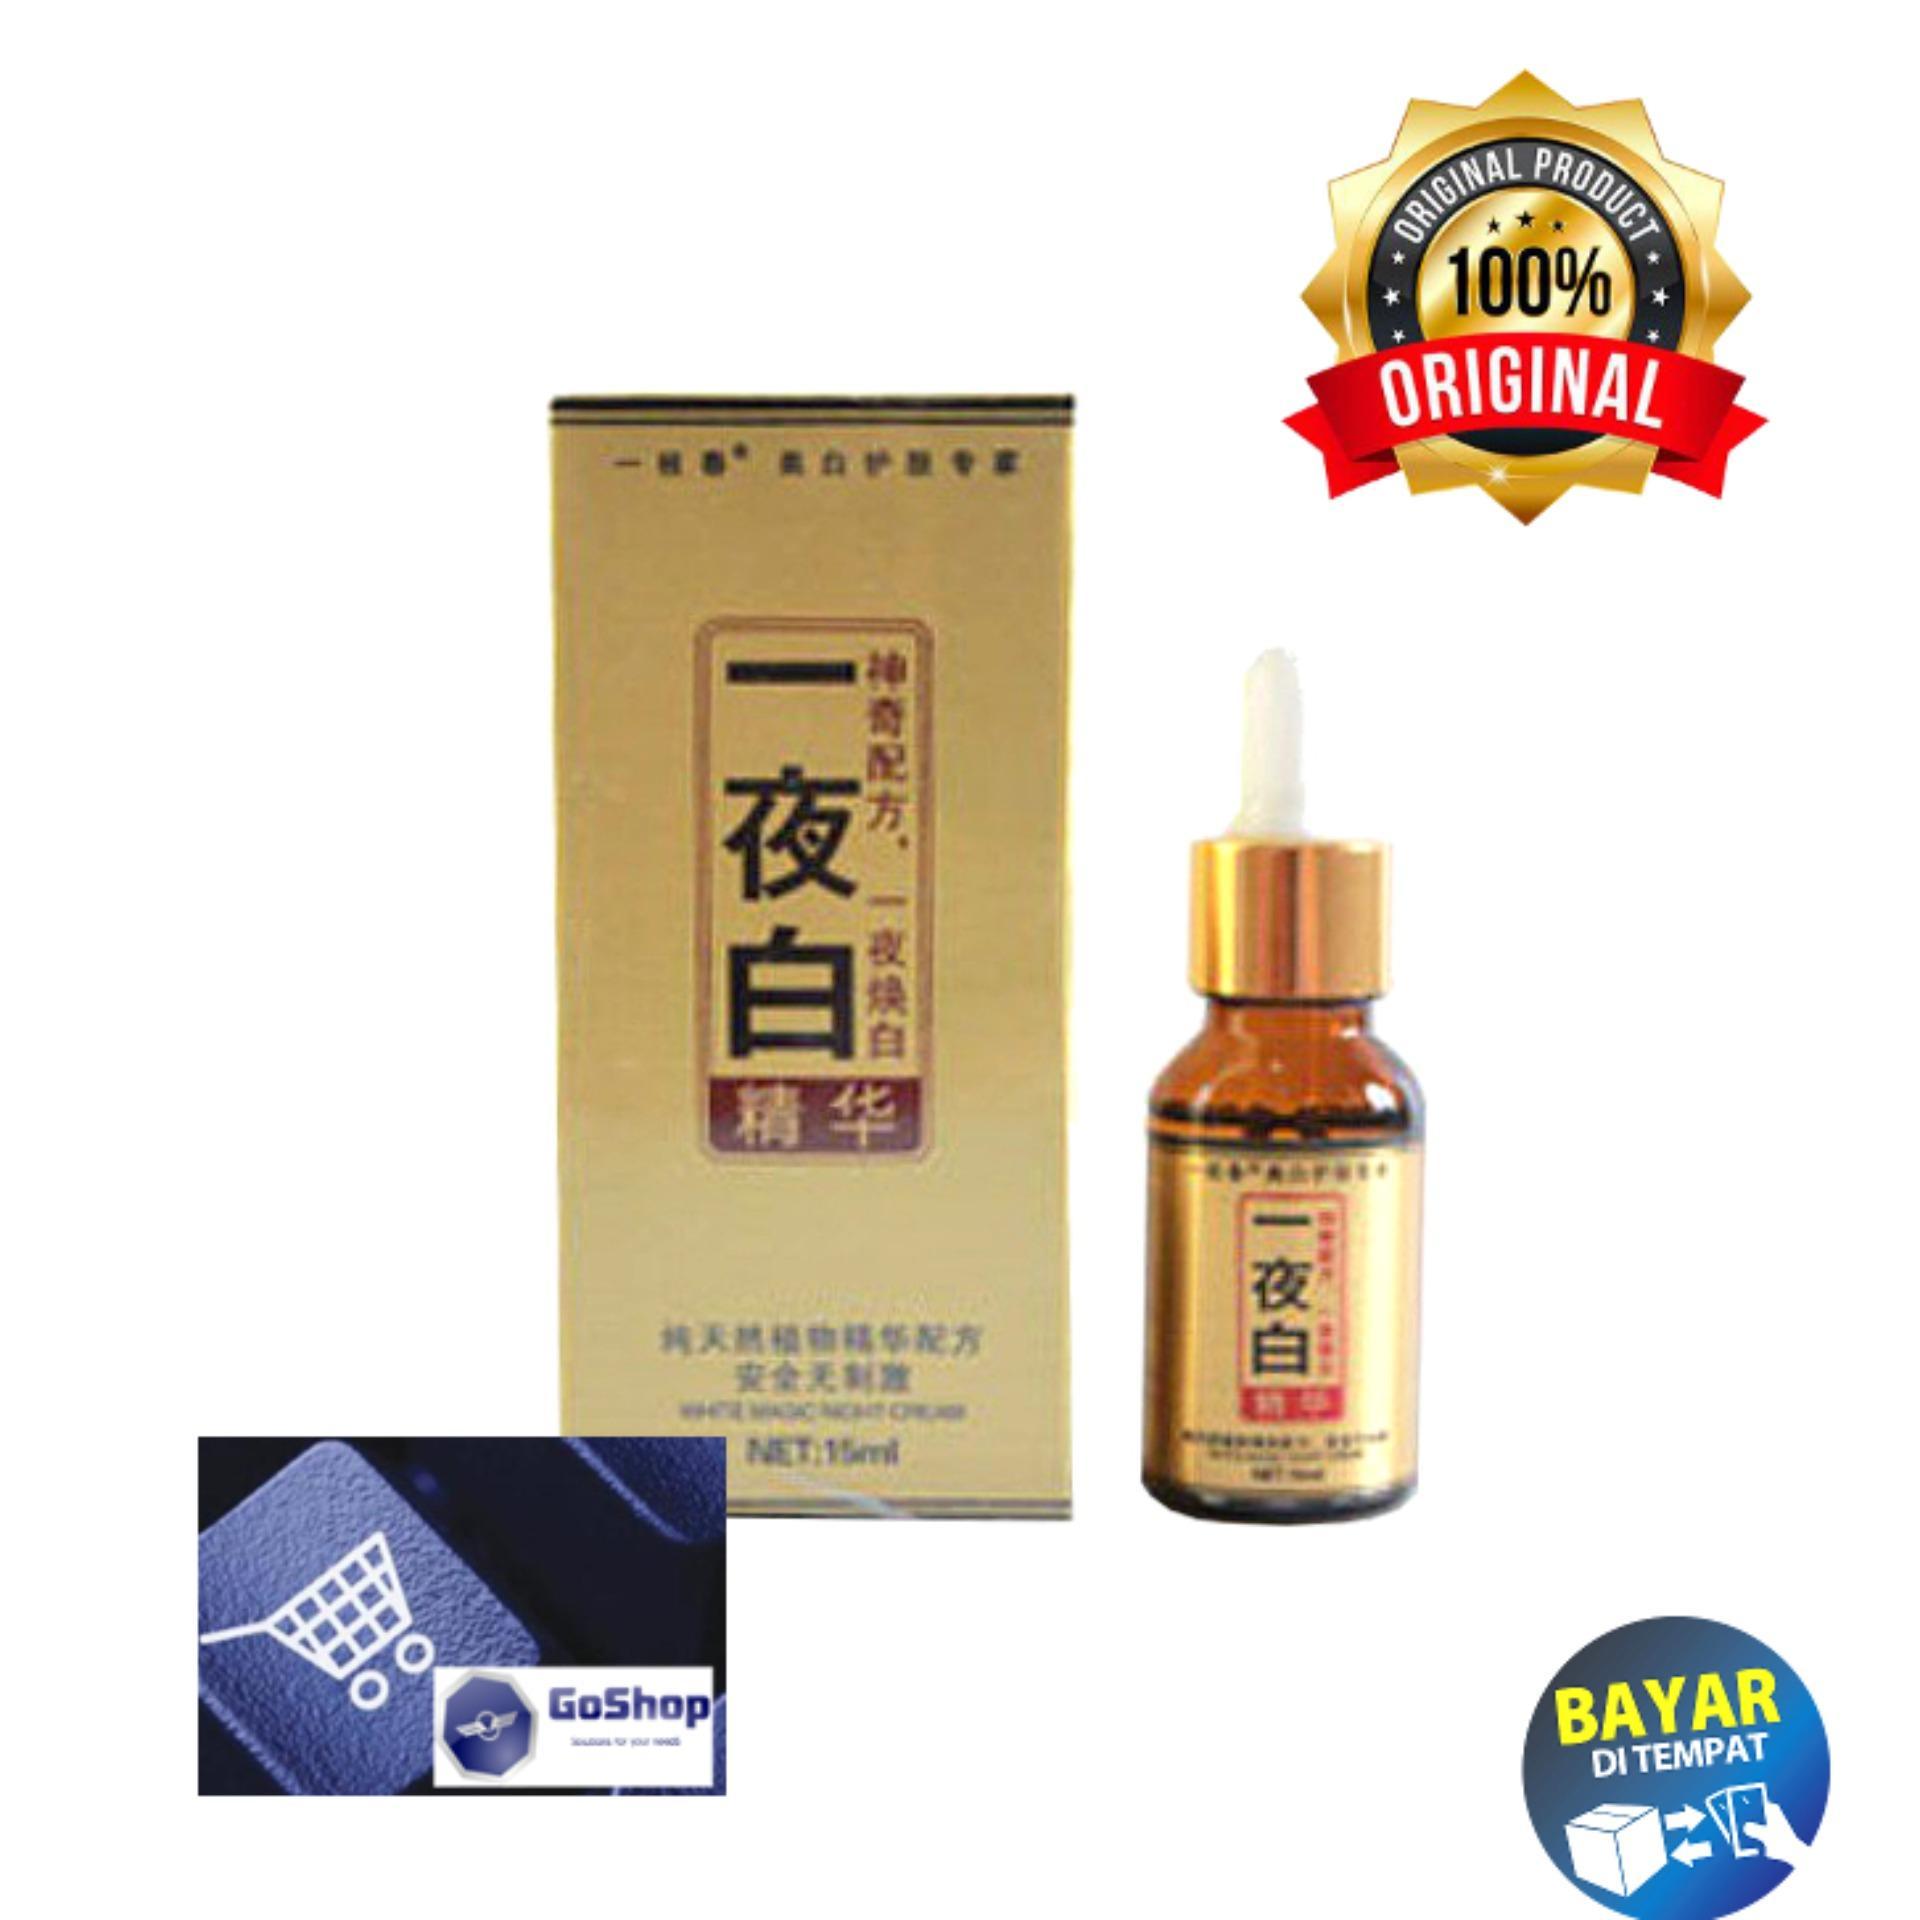 Jual Produk Gold Terbaru | lazada.co.id